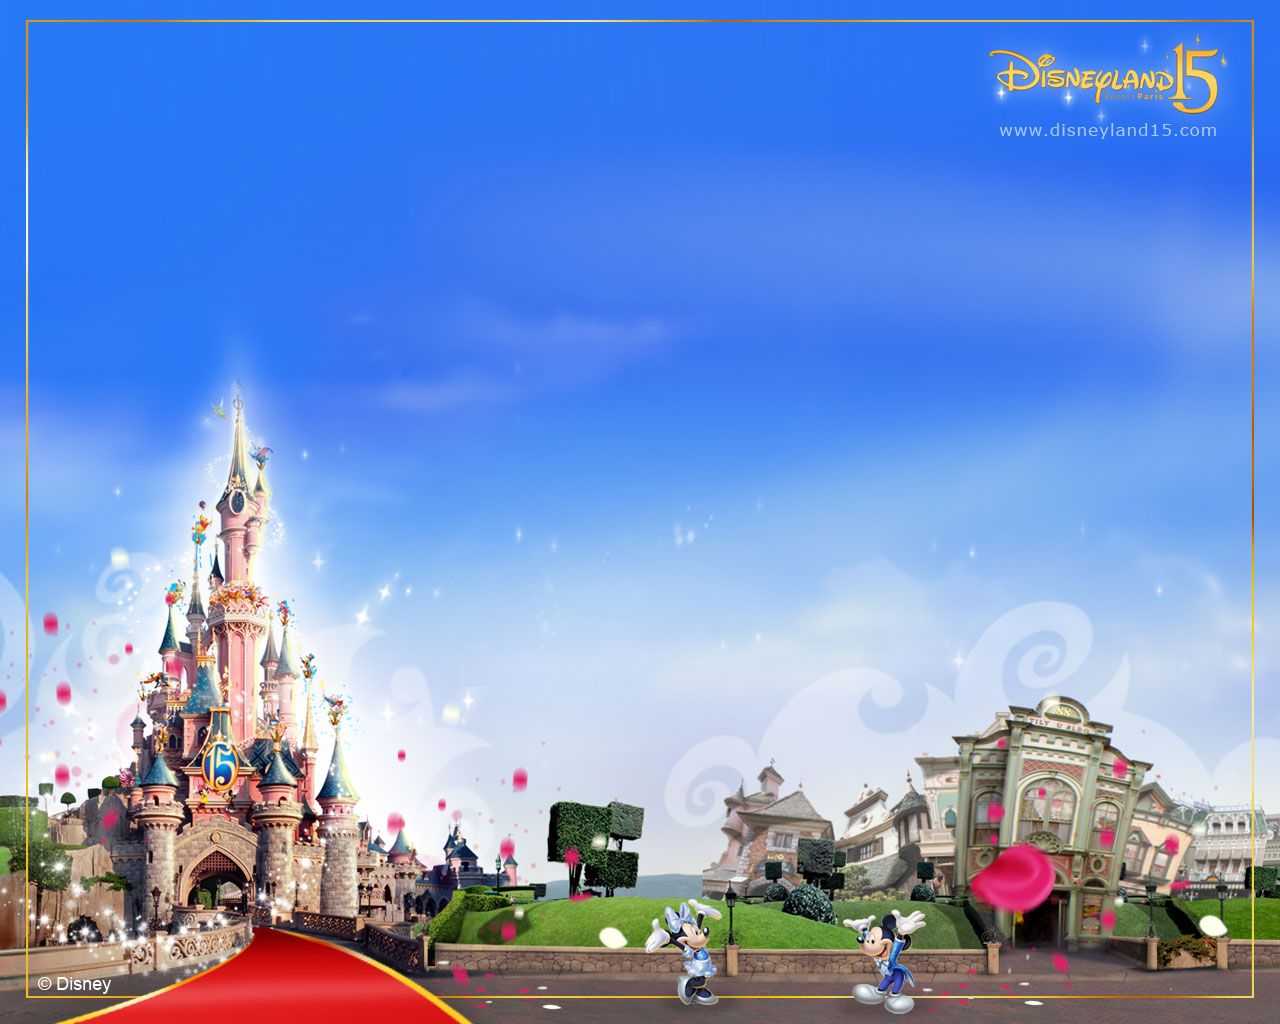 Disneyland Paris 15th anniversary creative